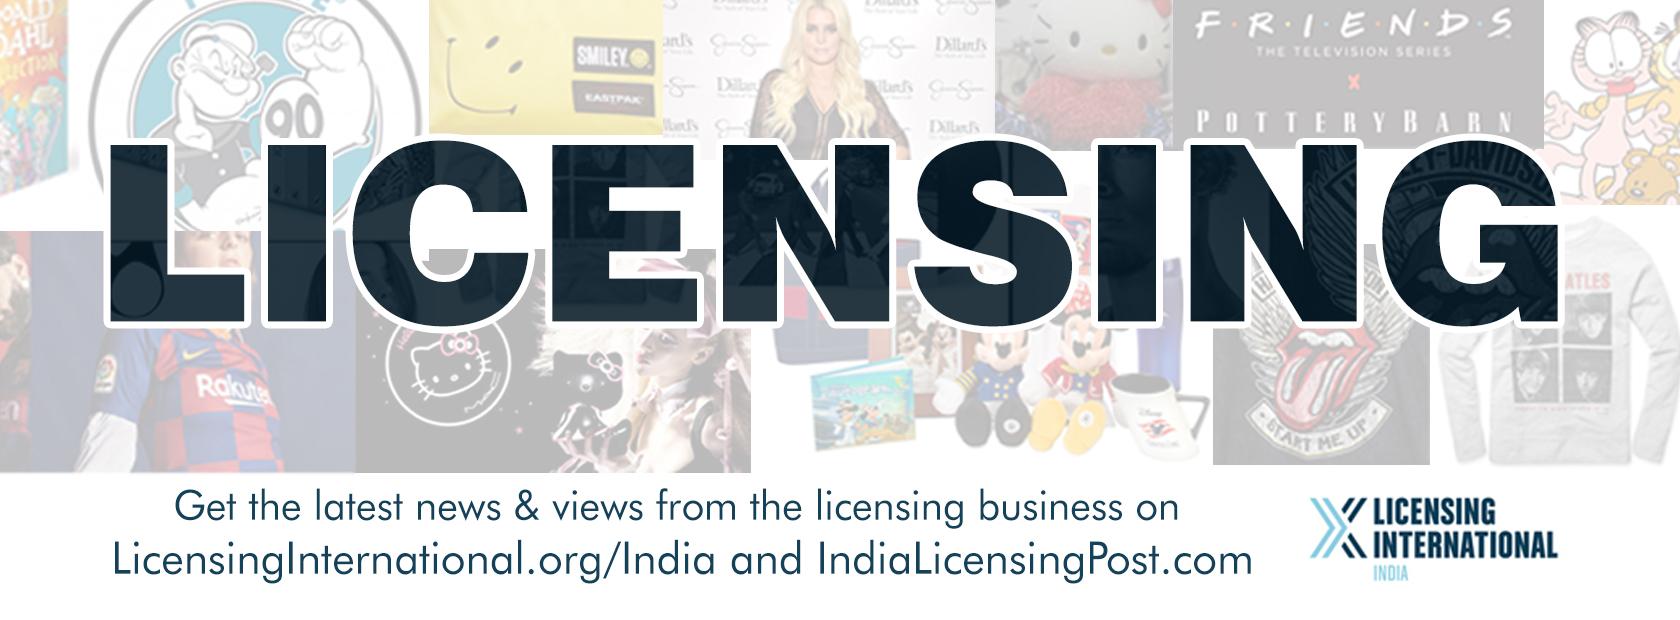 LicensingInternationalIndia